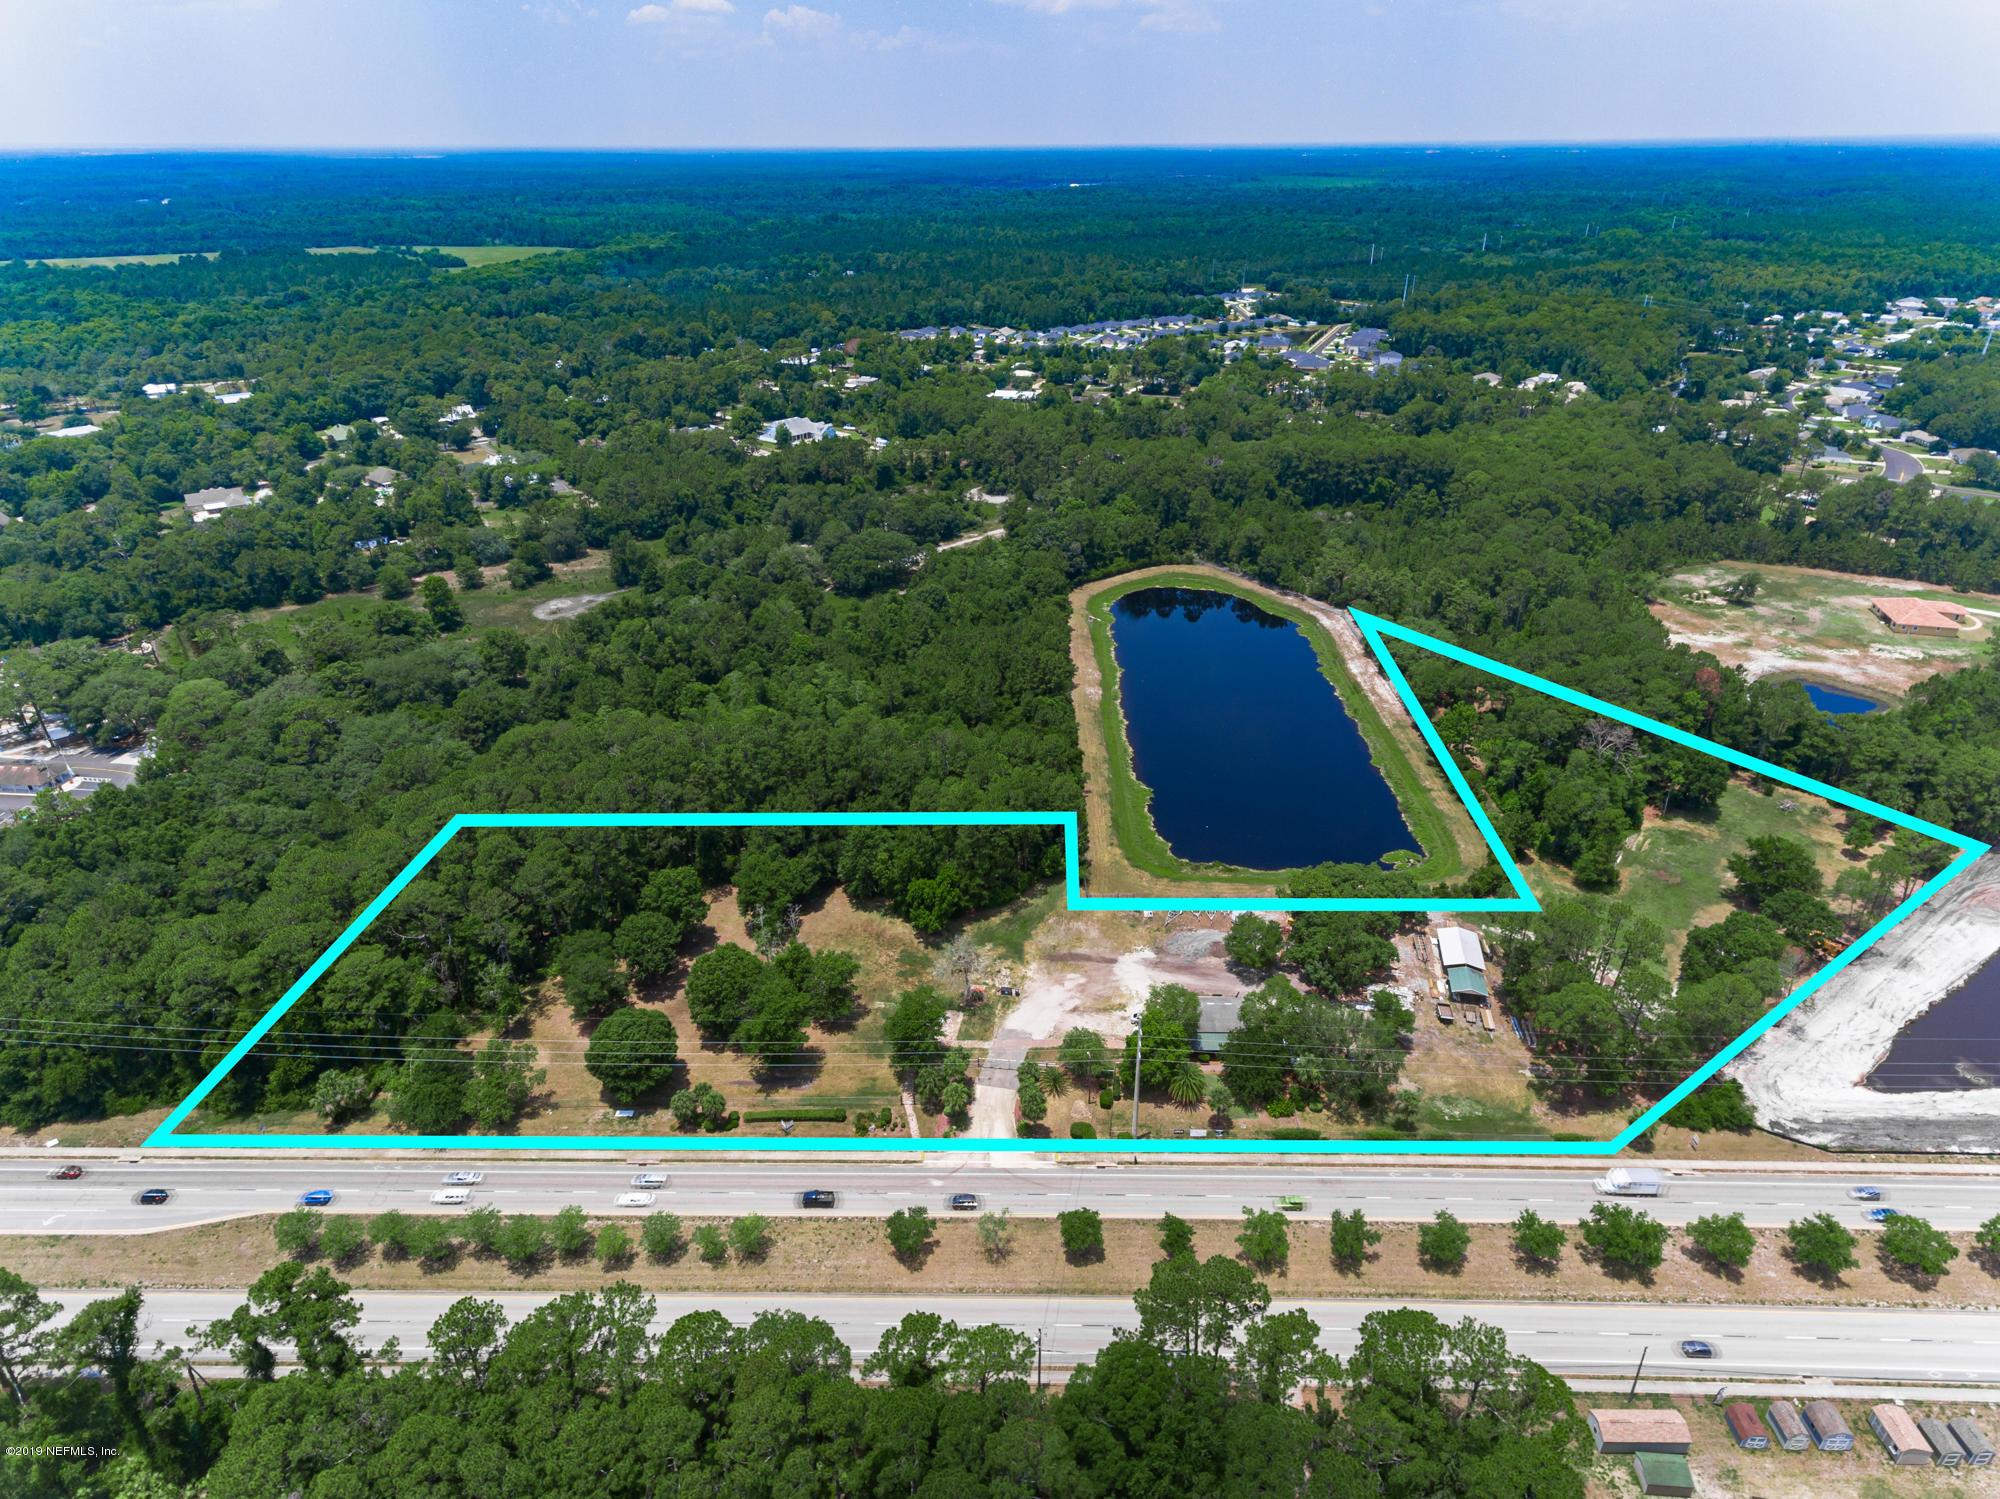 1401 State Rd 207, St. Augustine FL 32086 - Photo 1